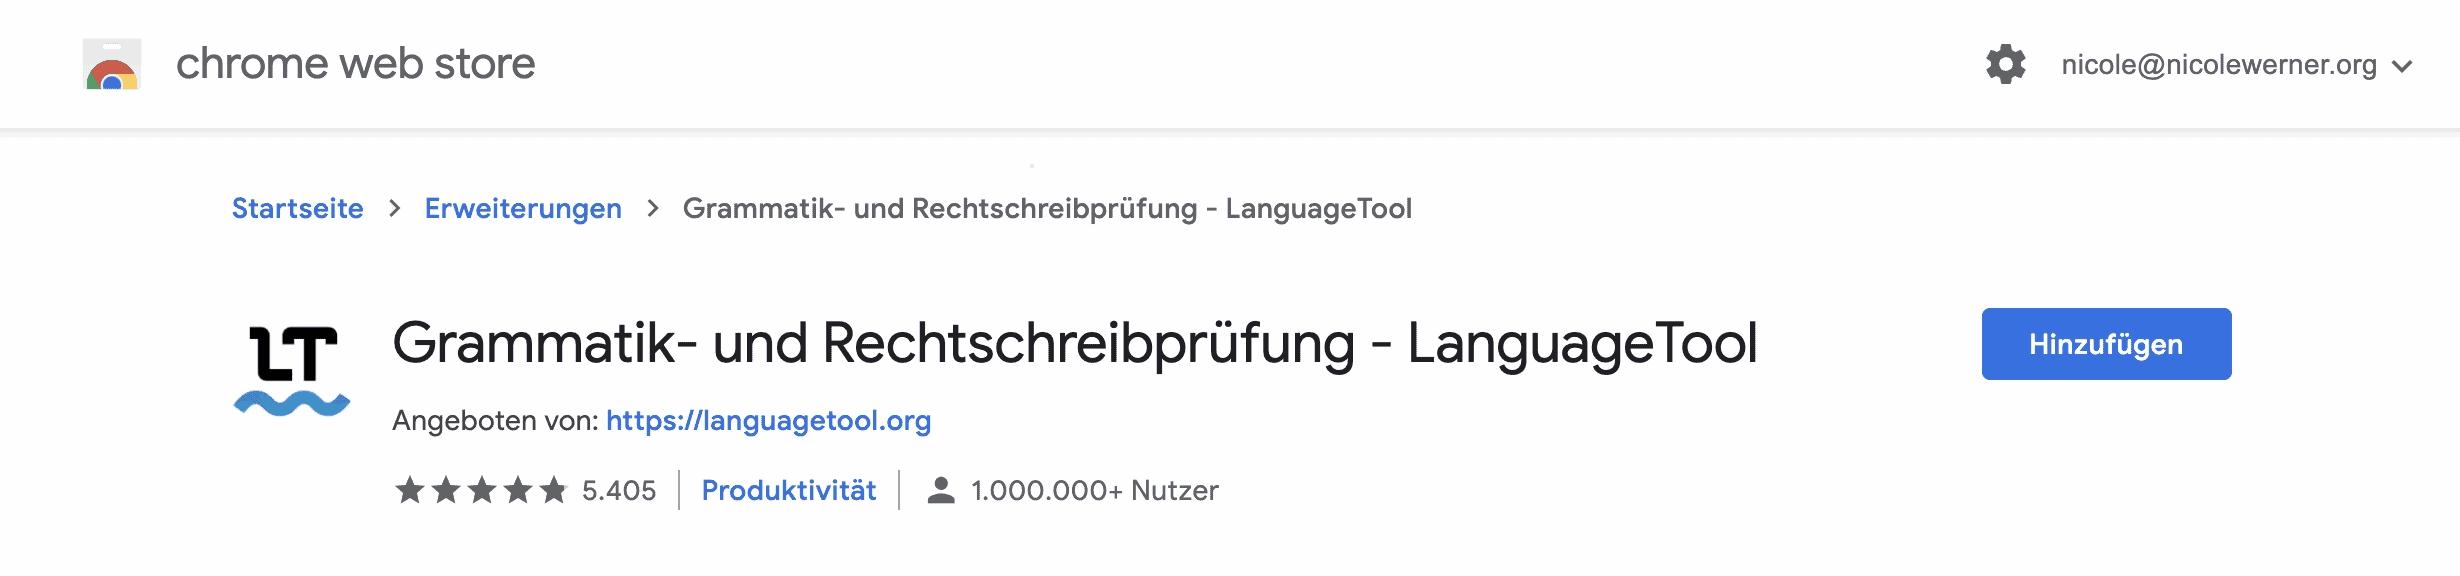 LanguageTool hinzufügen